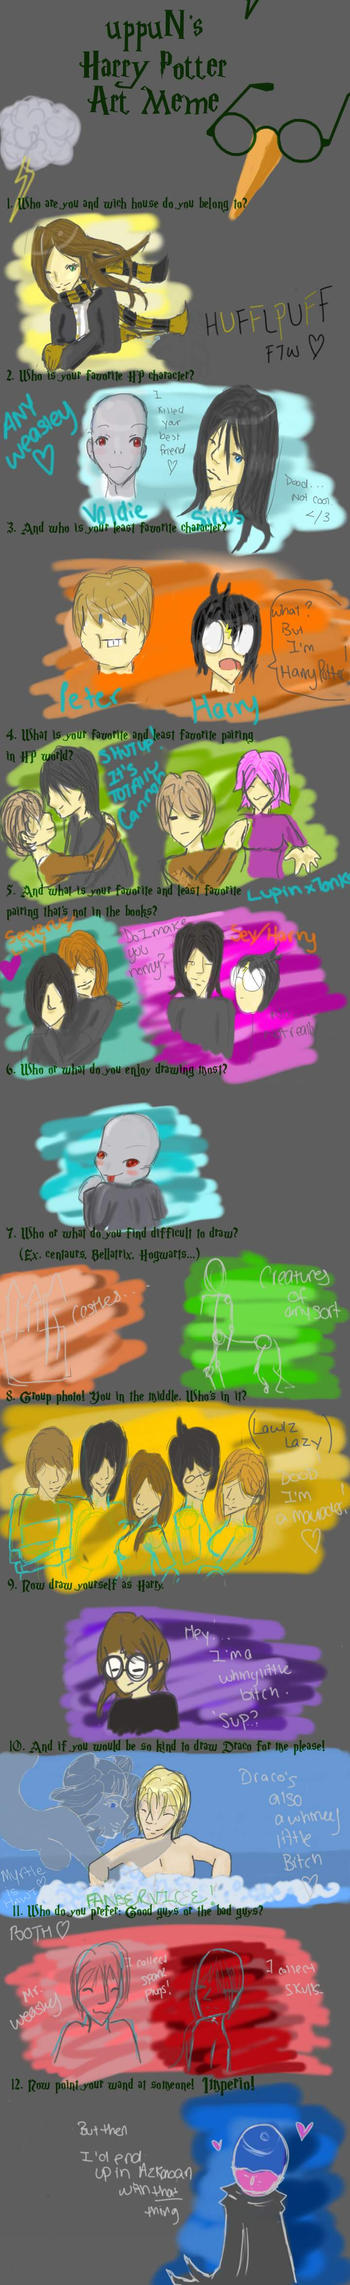 uppuN's HP art Meme by OneofFive